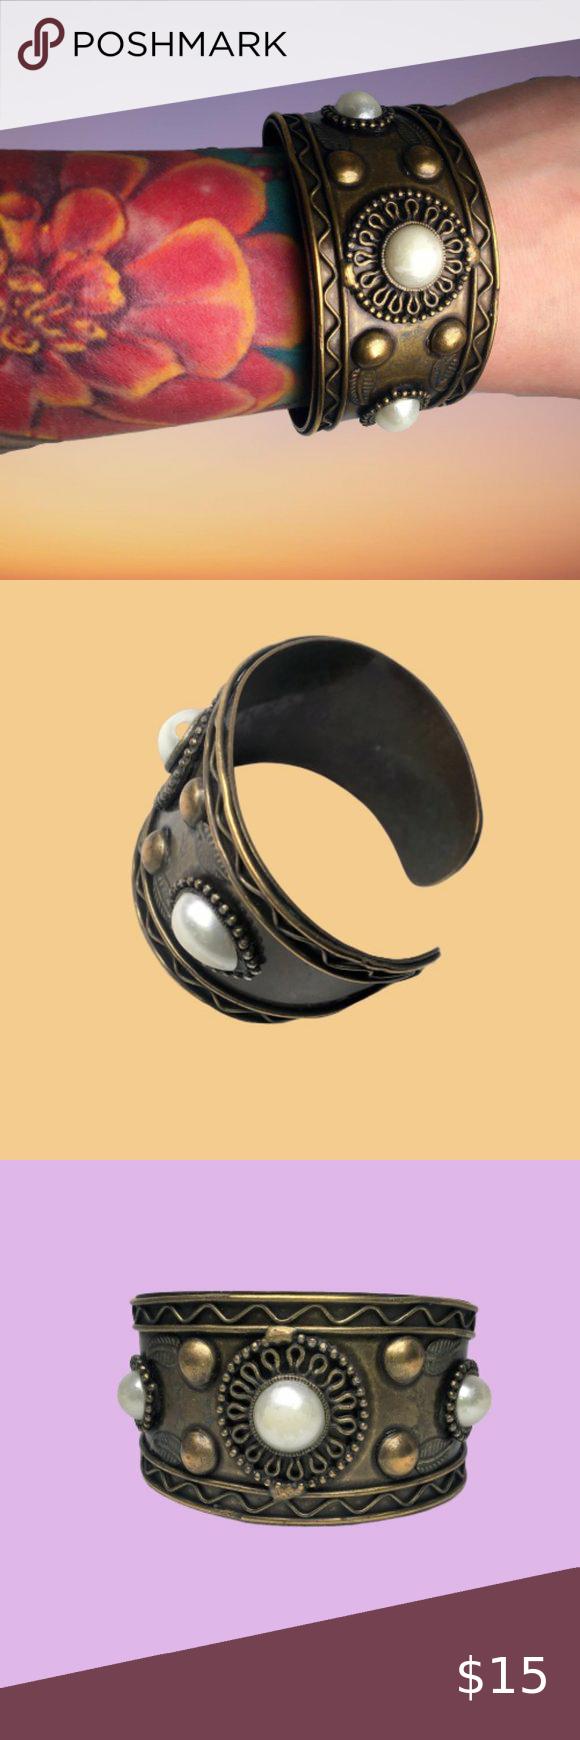 GOld tone cuff bracelet with costume pearls detail GOld tone cuff bracelet with costume pearls detail #cuff #statement #bracelet #superhero #wonderwoman Jewelry Bracelets